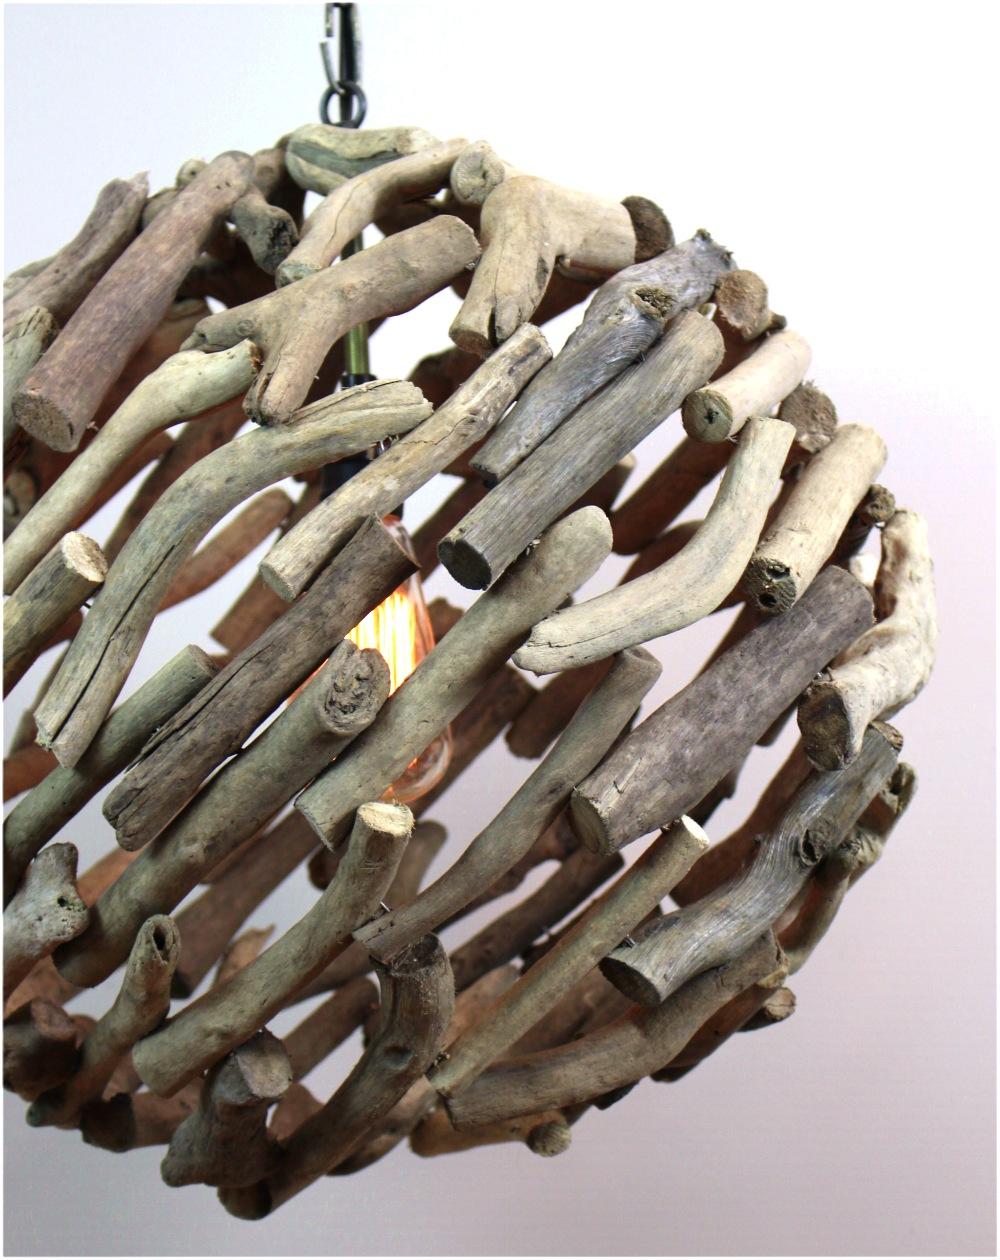 Big Driftwood Ball Pendant Chandelier Ceiling Mounted Light Fixture Nautical Rustic Lodge Feel